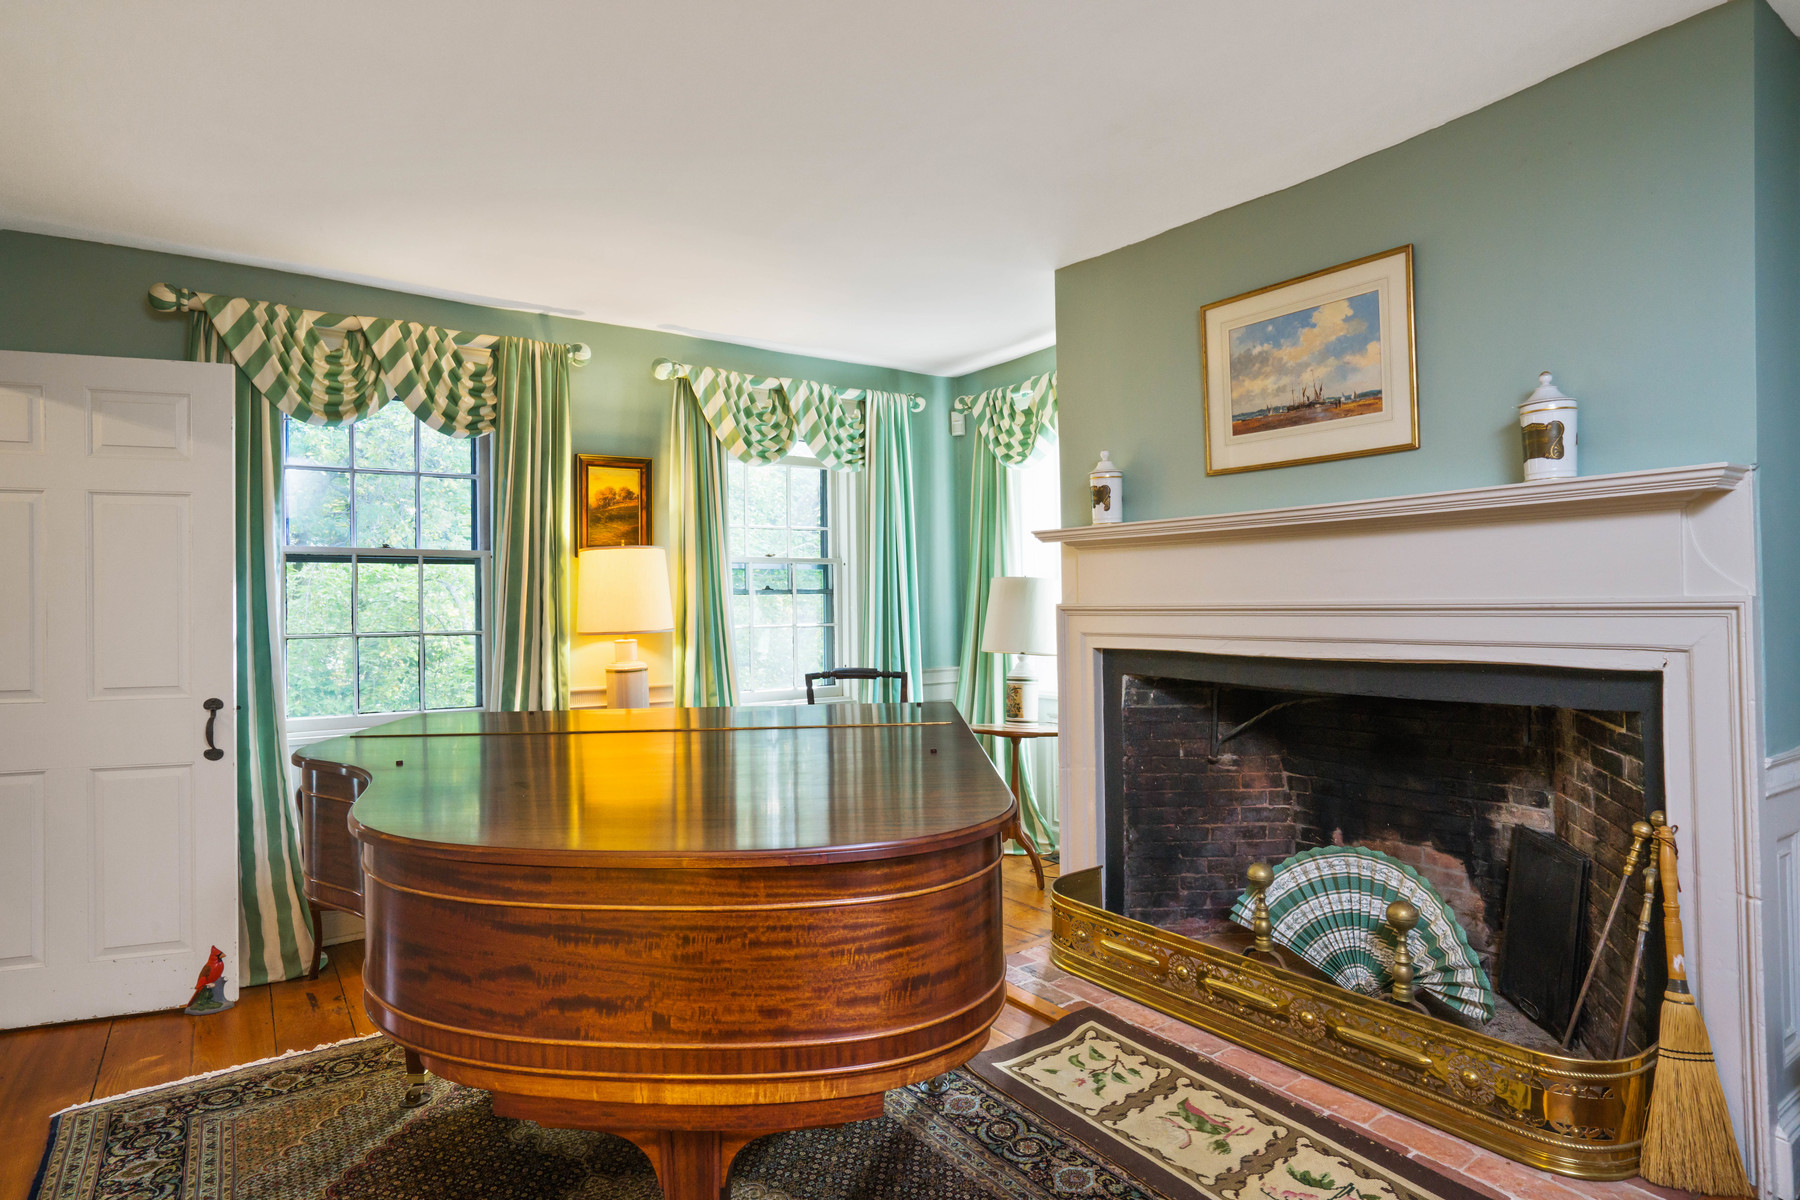 Additional photo for property listing at 468 Highland Street, Hamilton  Hamilton, Massachusetts 01982 United States